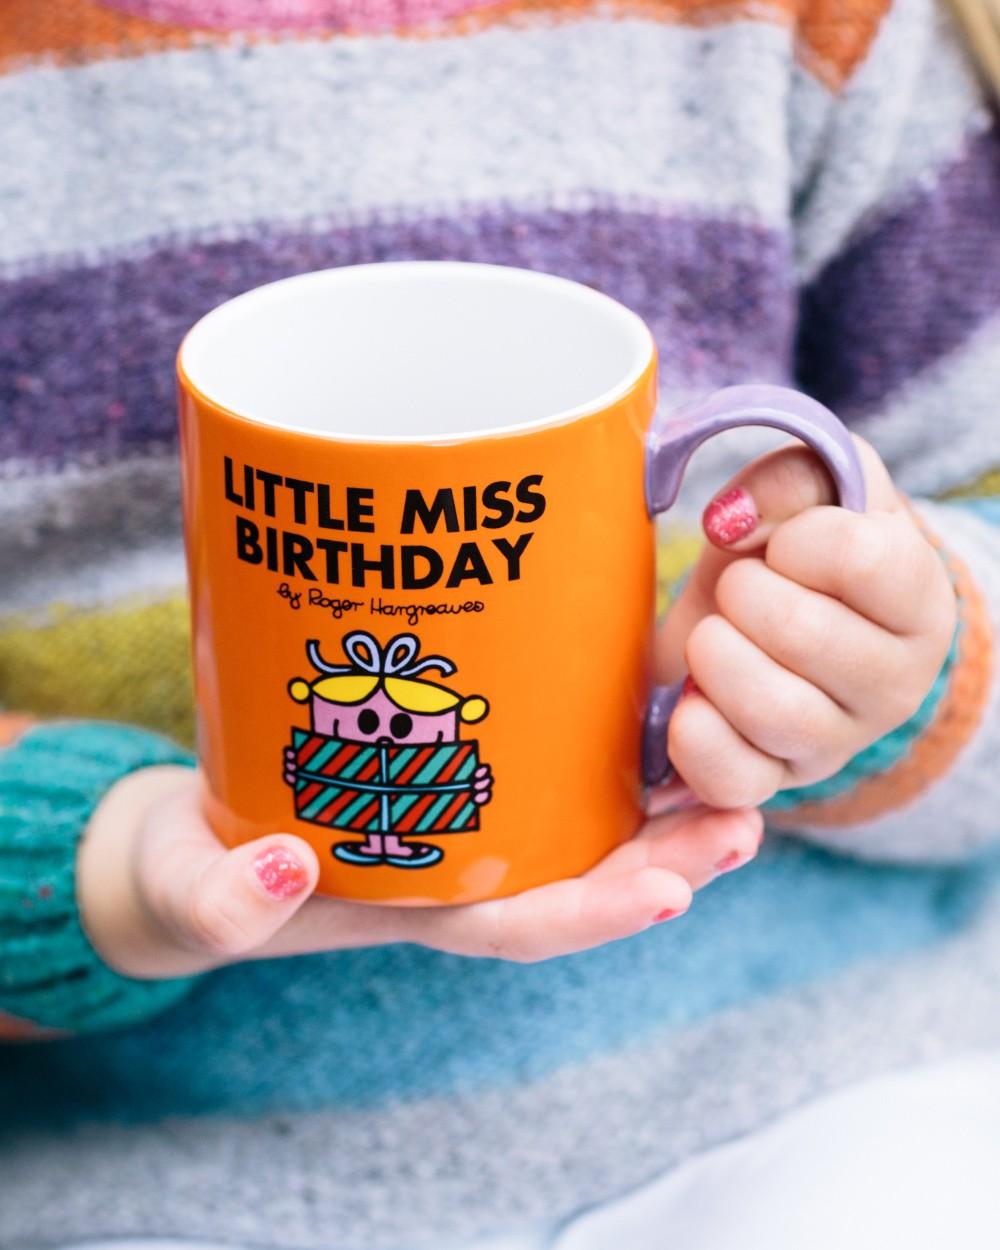 Little Miss Birthday Mug